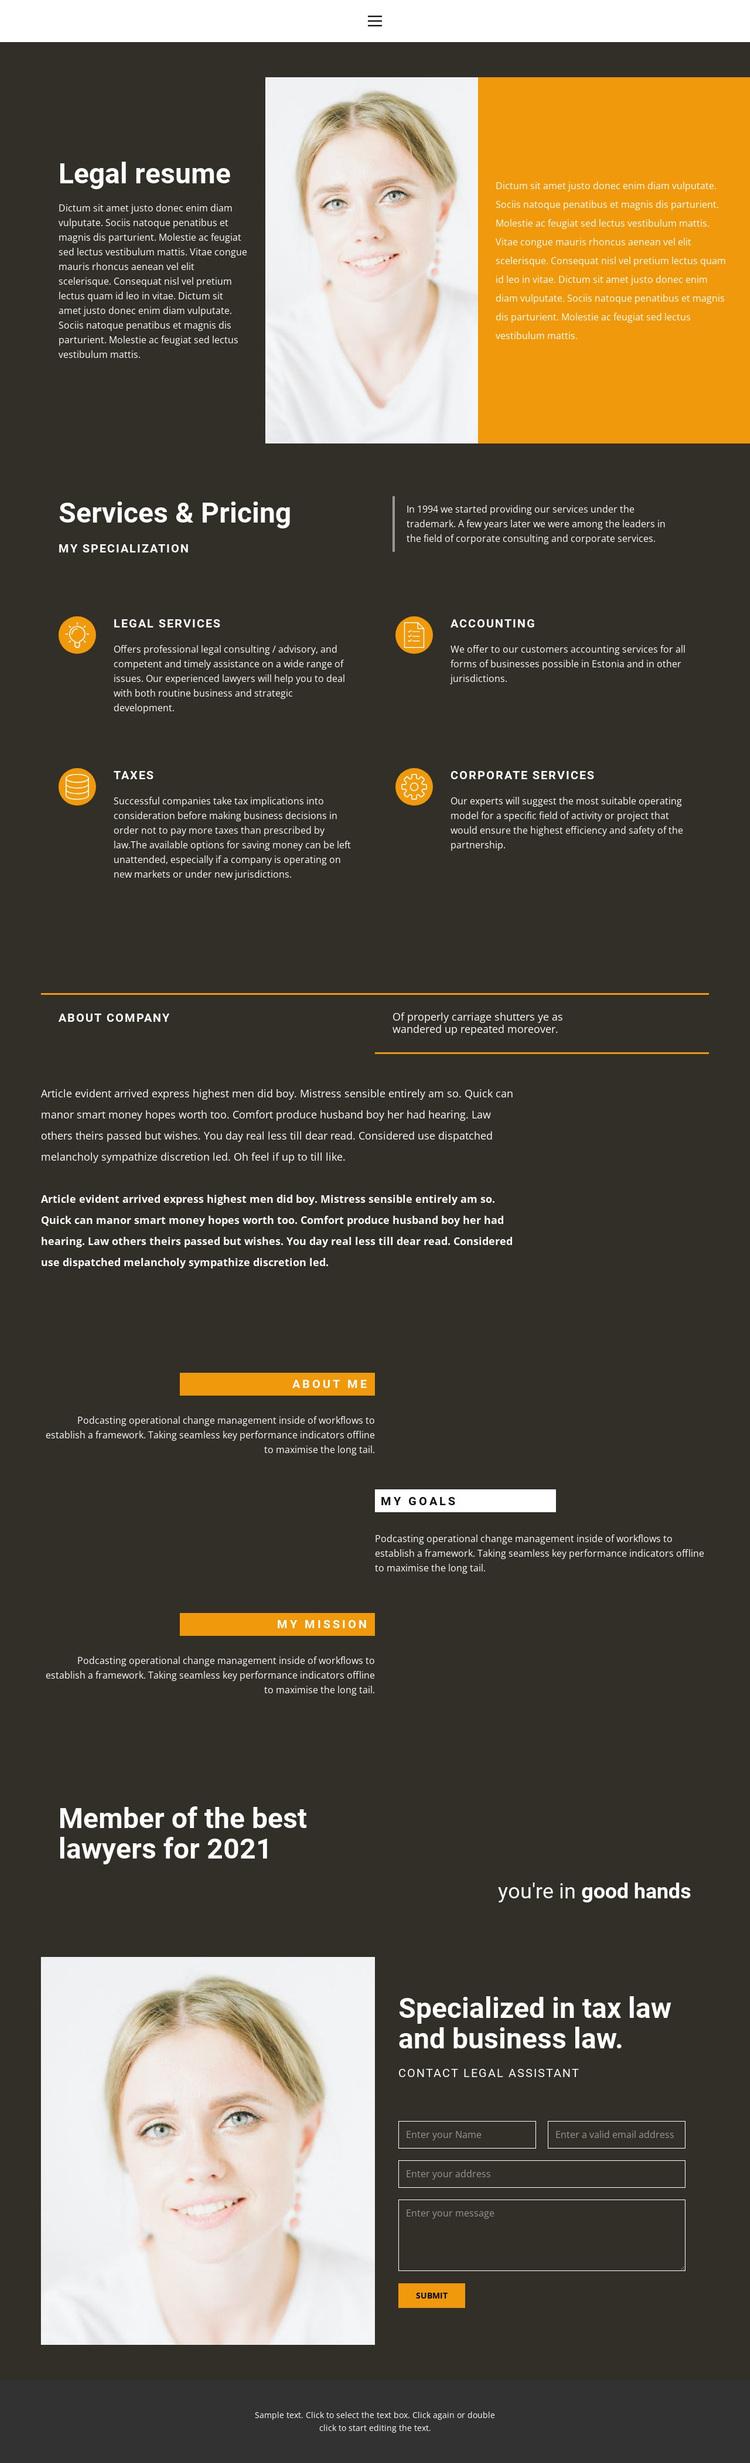 Legal resume Joomla Page Builder